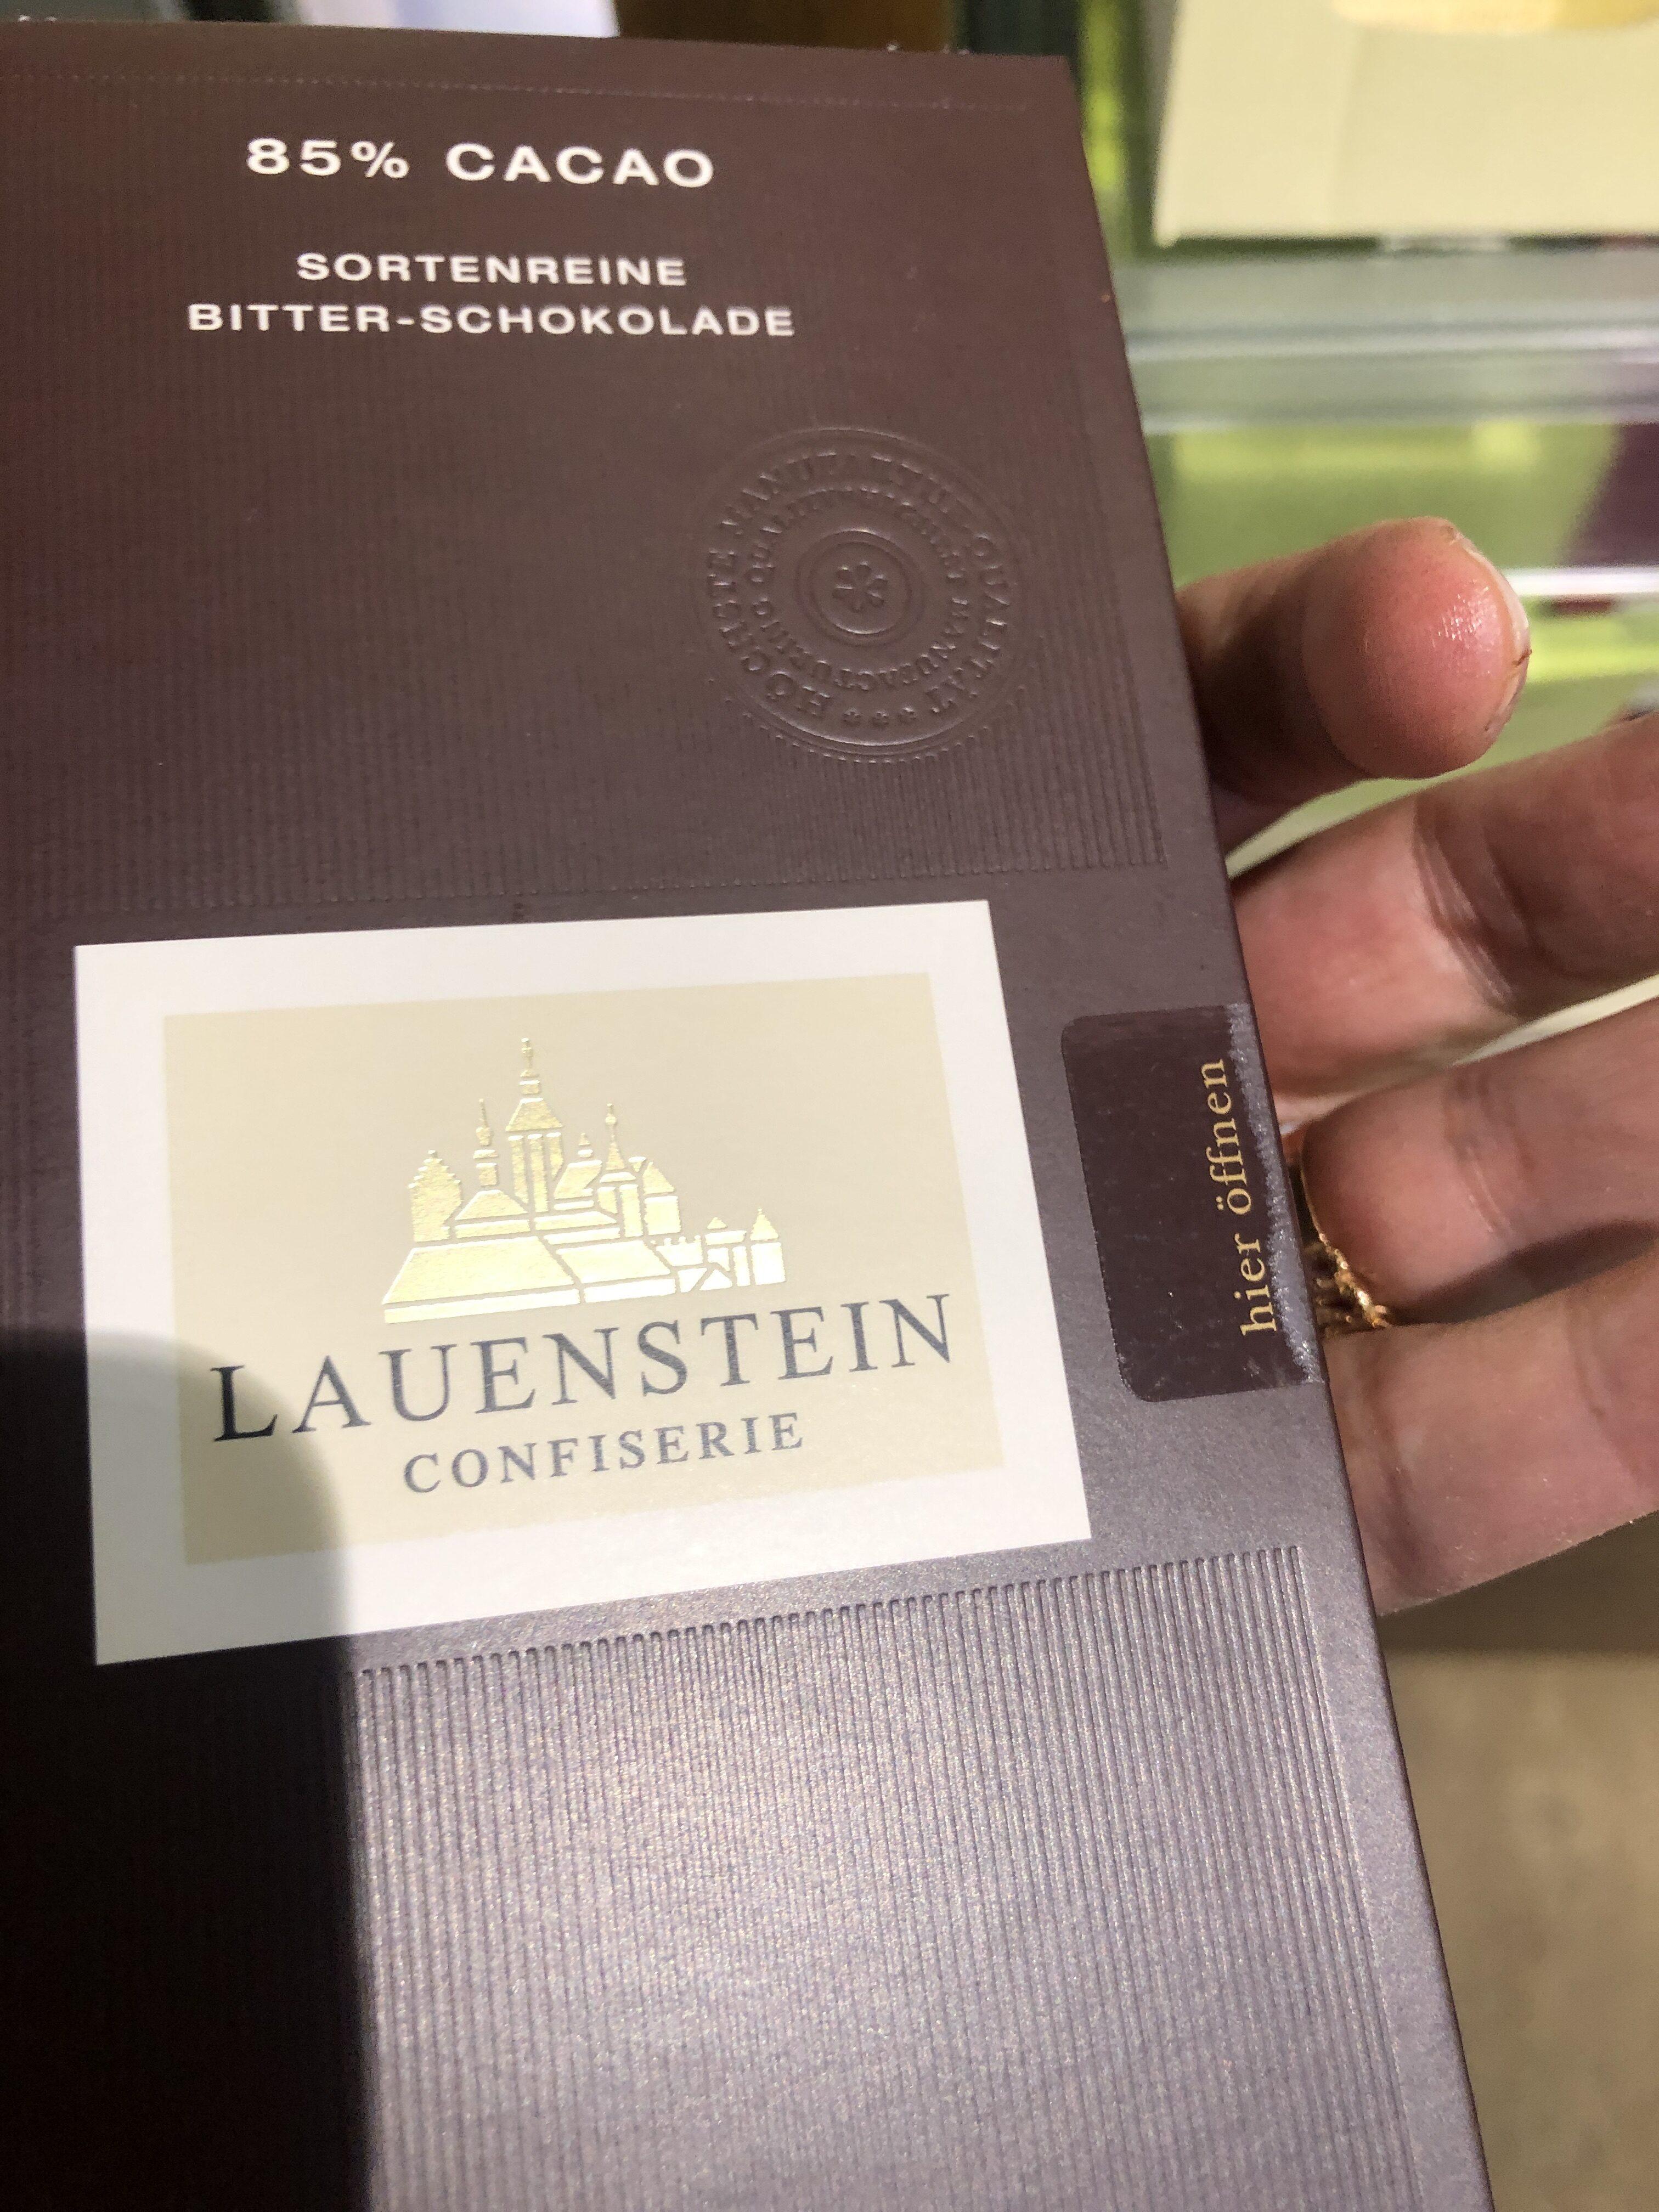 Sortenreine Bitter-Schokolade - Product